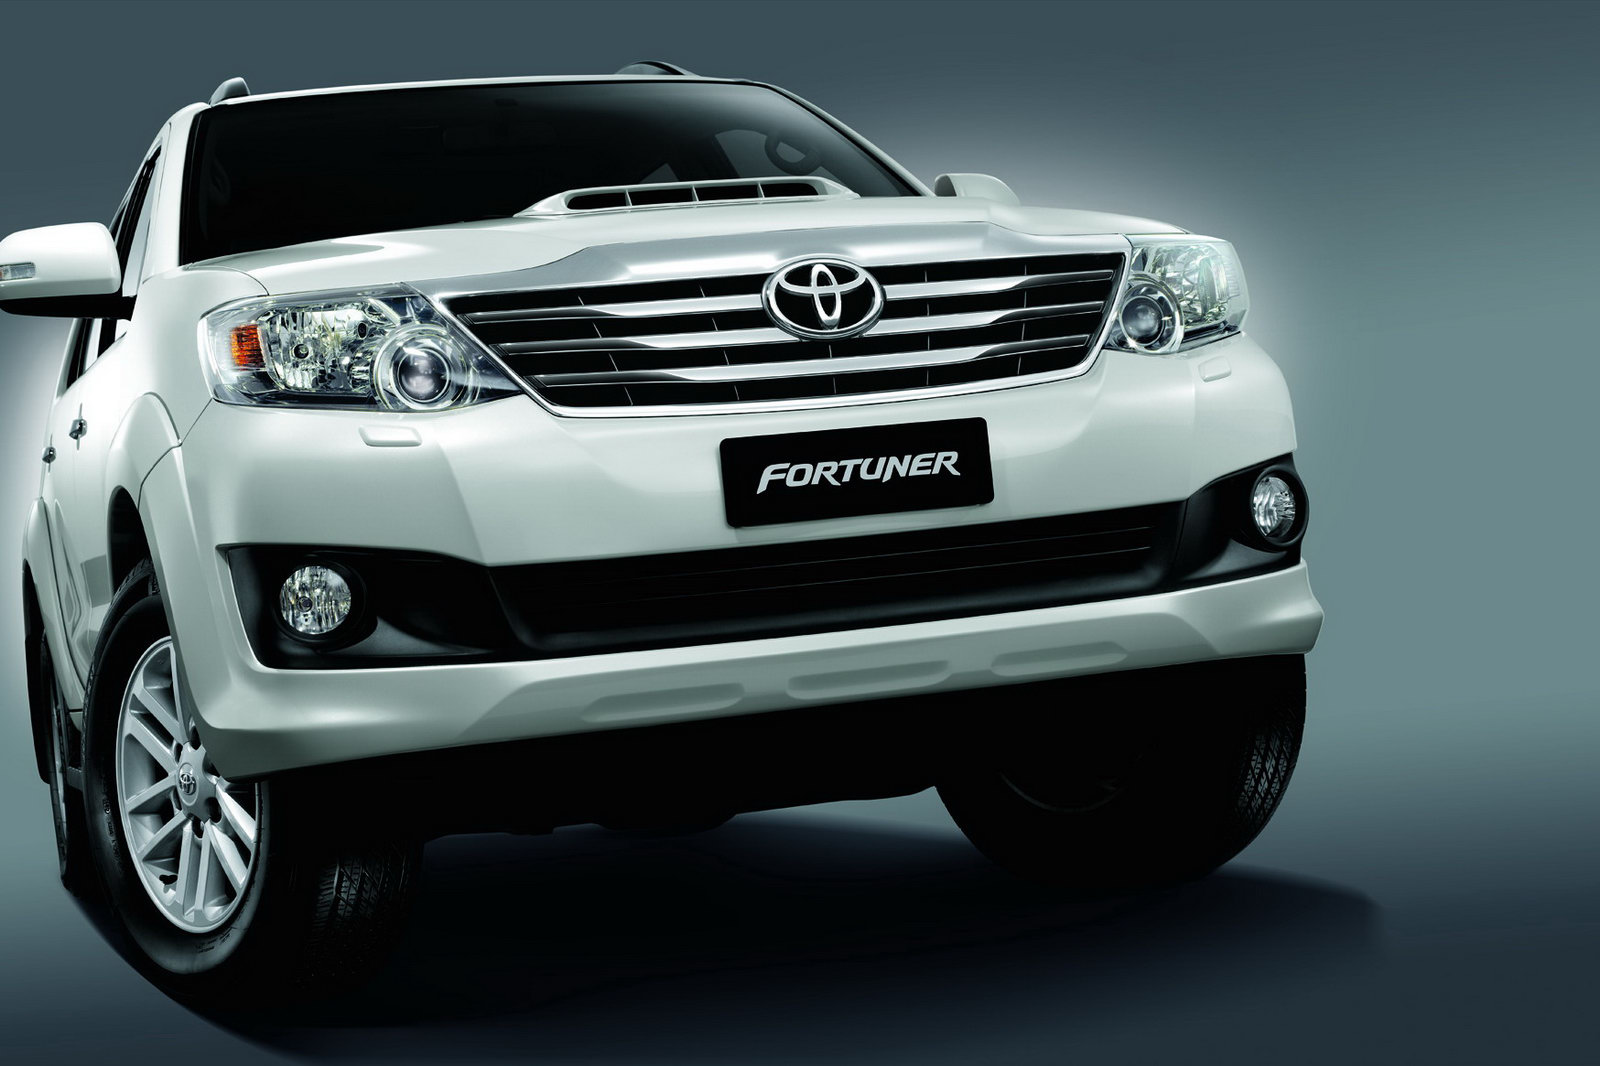 New Toyota Fortuner   Toyota Fortuner Wallpaper Desktop 1600x1066